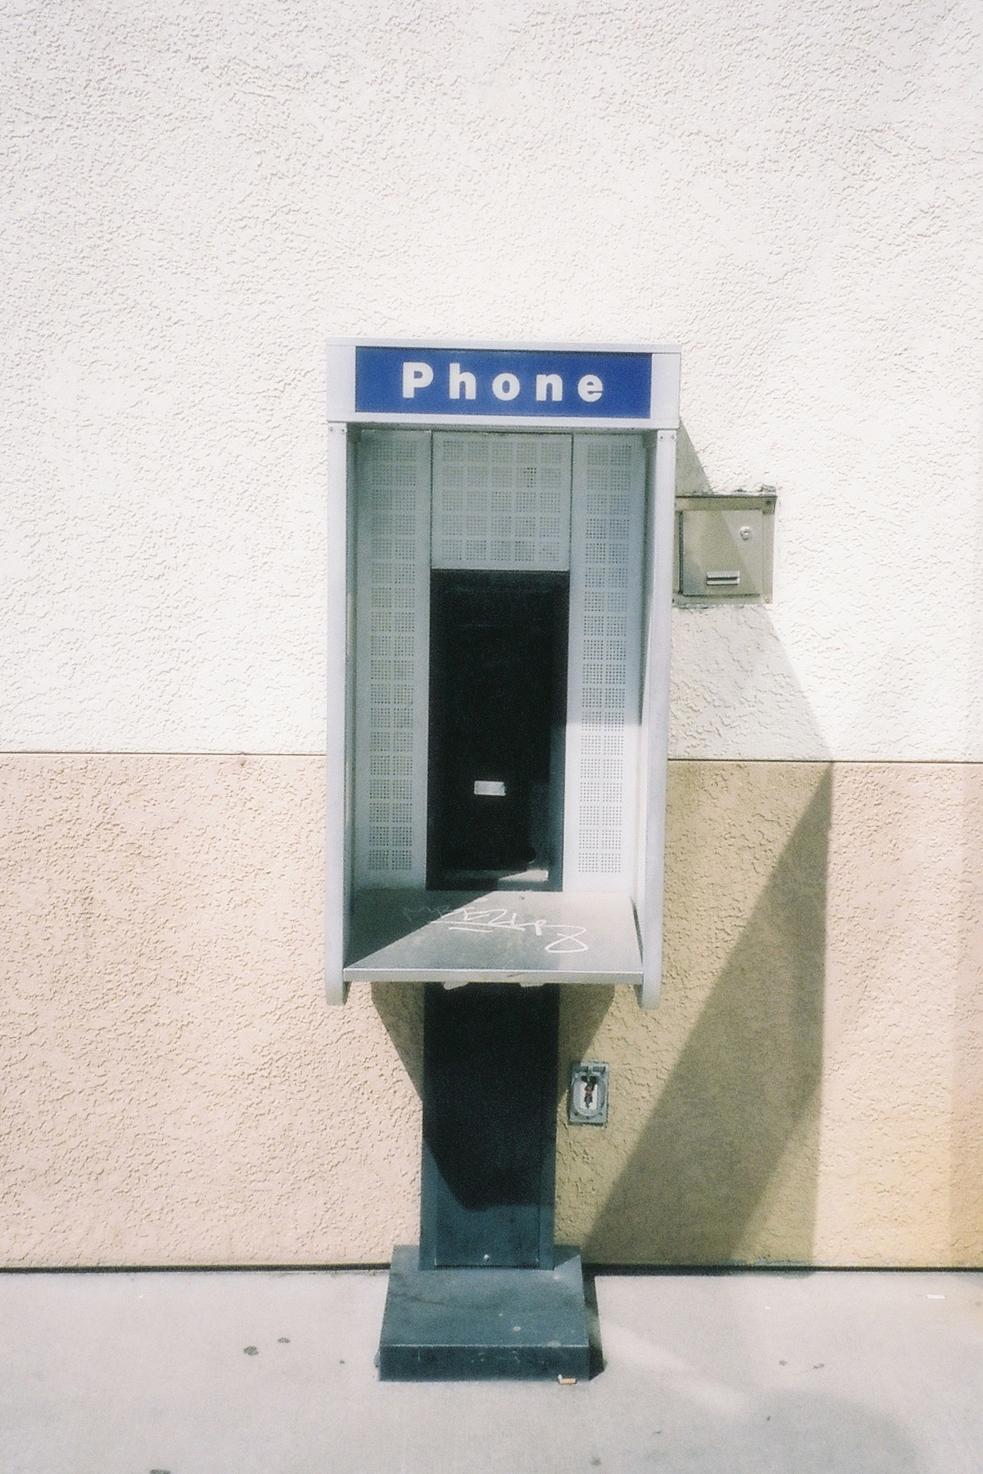 Phone New.jpg